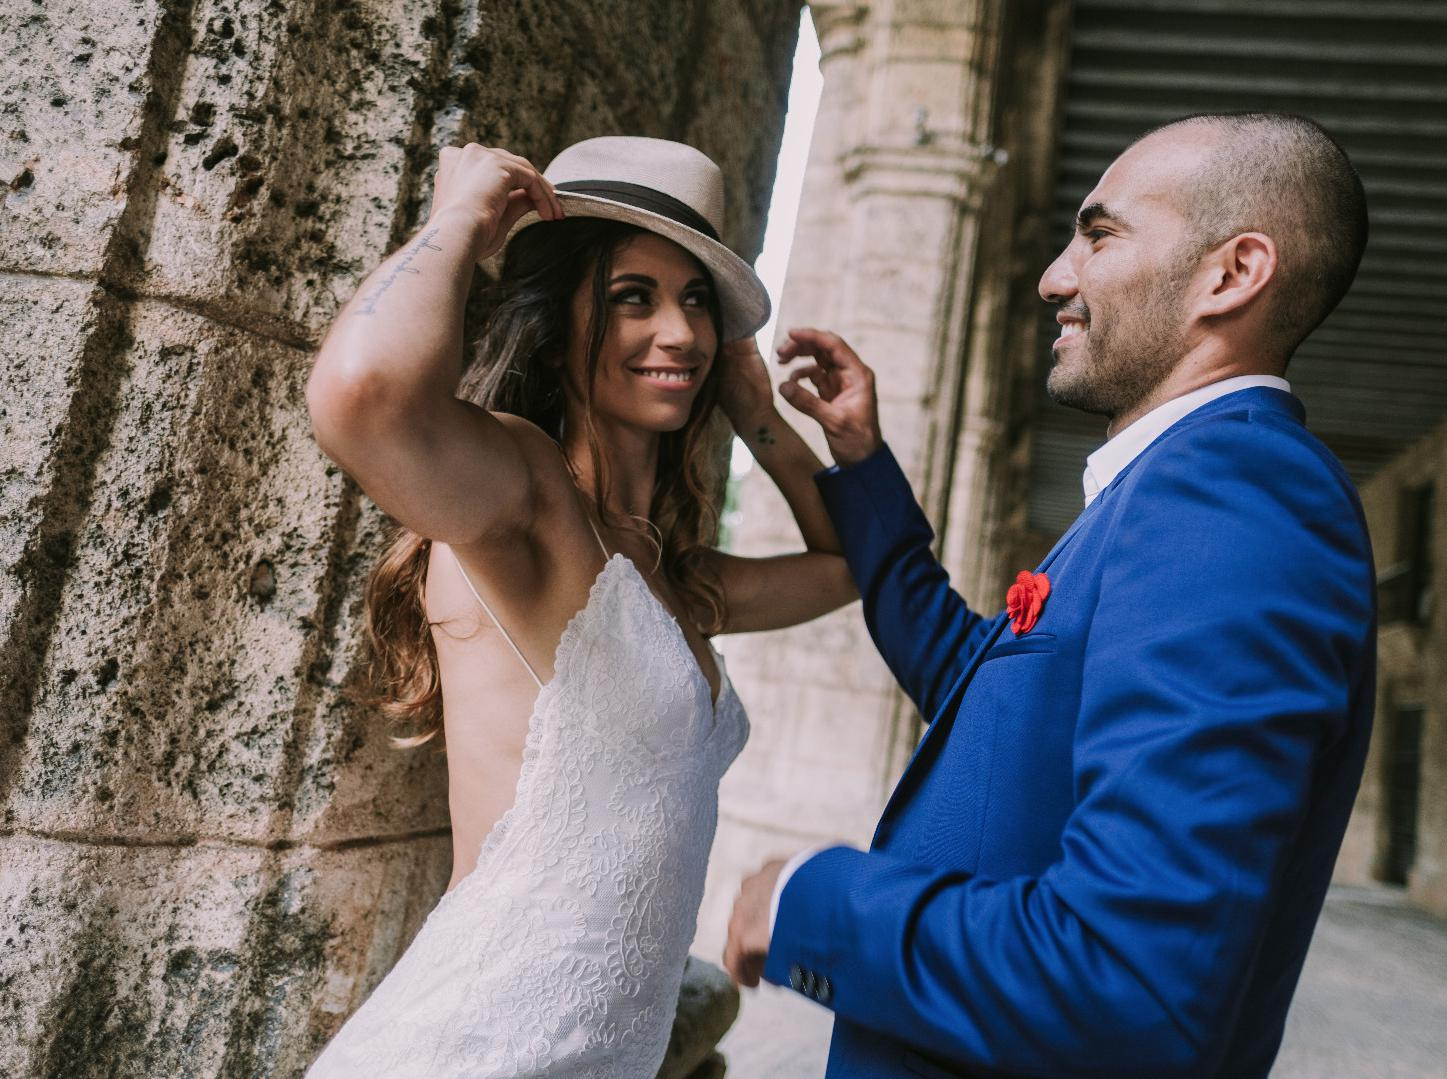 weddings-sin-clasificar-no-theme-cuba-28842.jpg